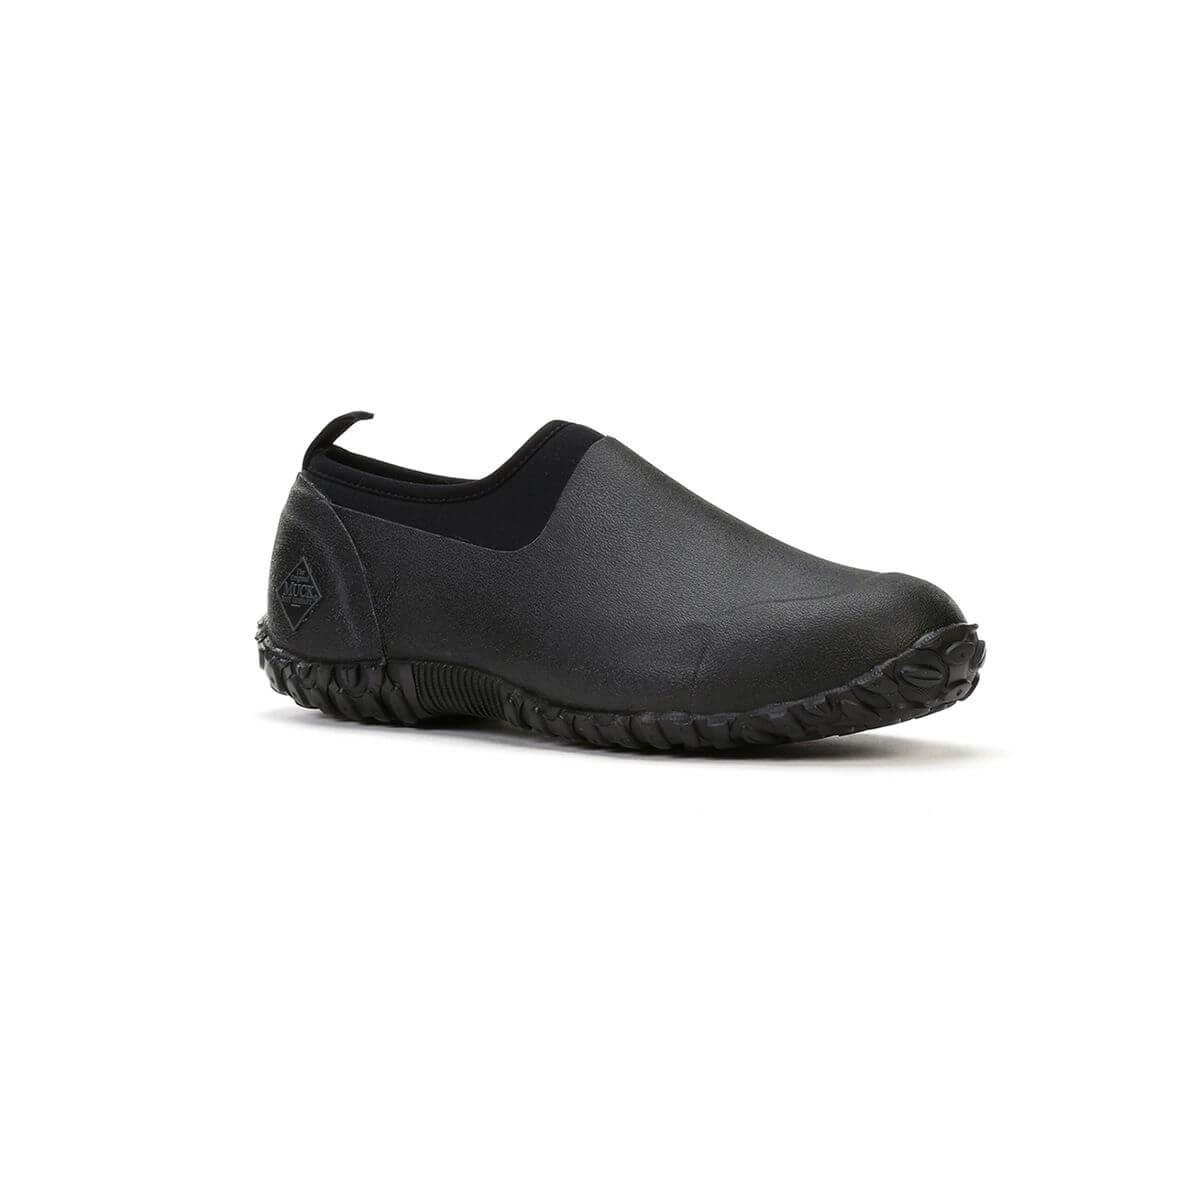 81d9ff4e9fb Muck Boot - Men's Muckster II Low Shoe - Black - UK 8 / EU 42